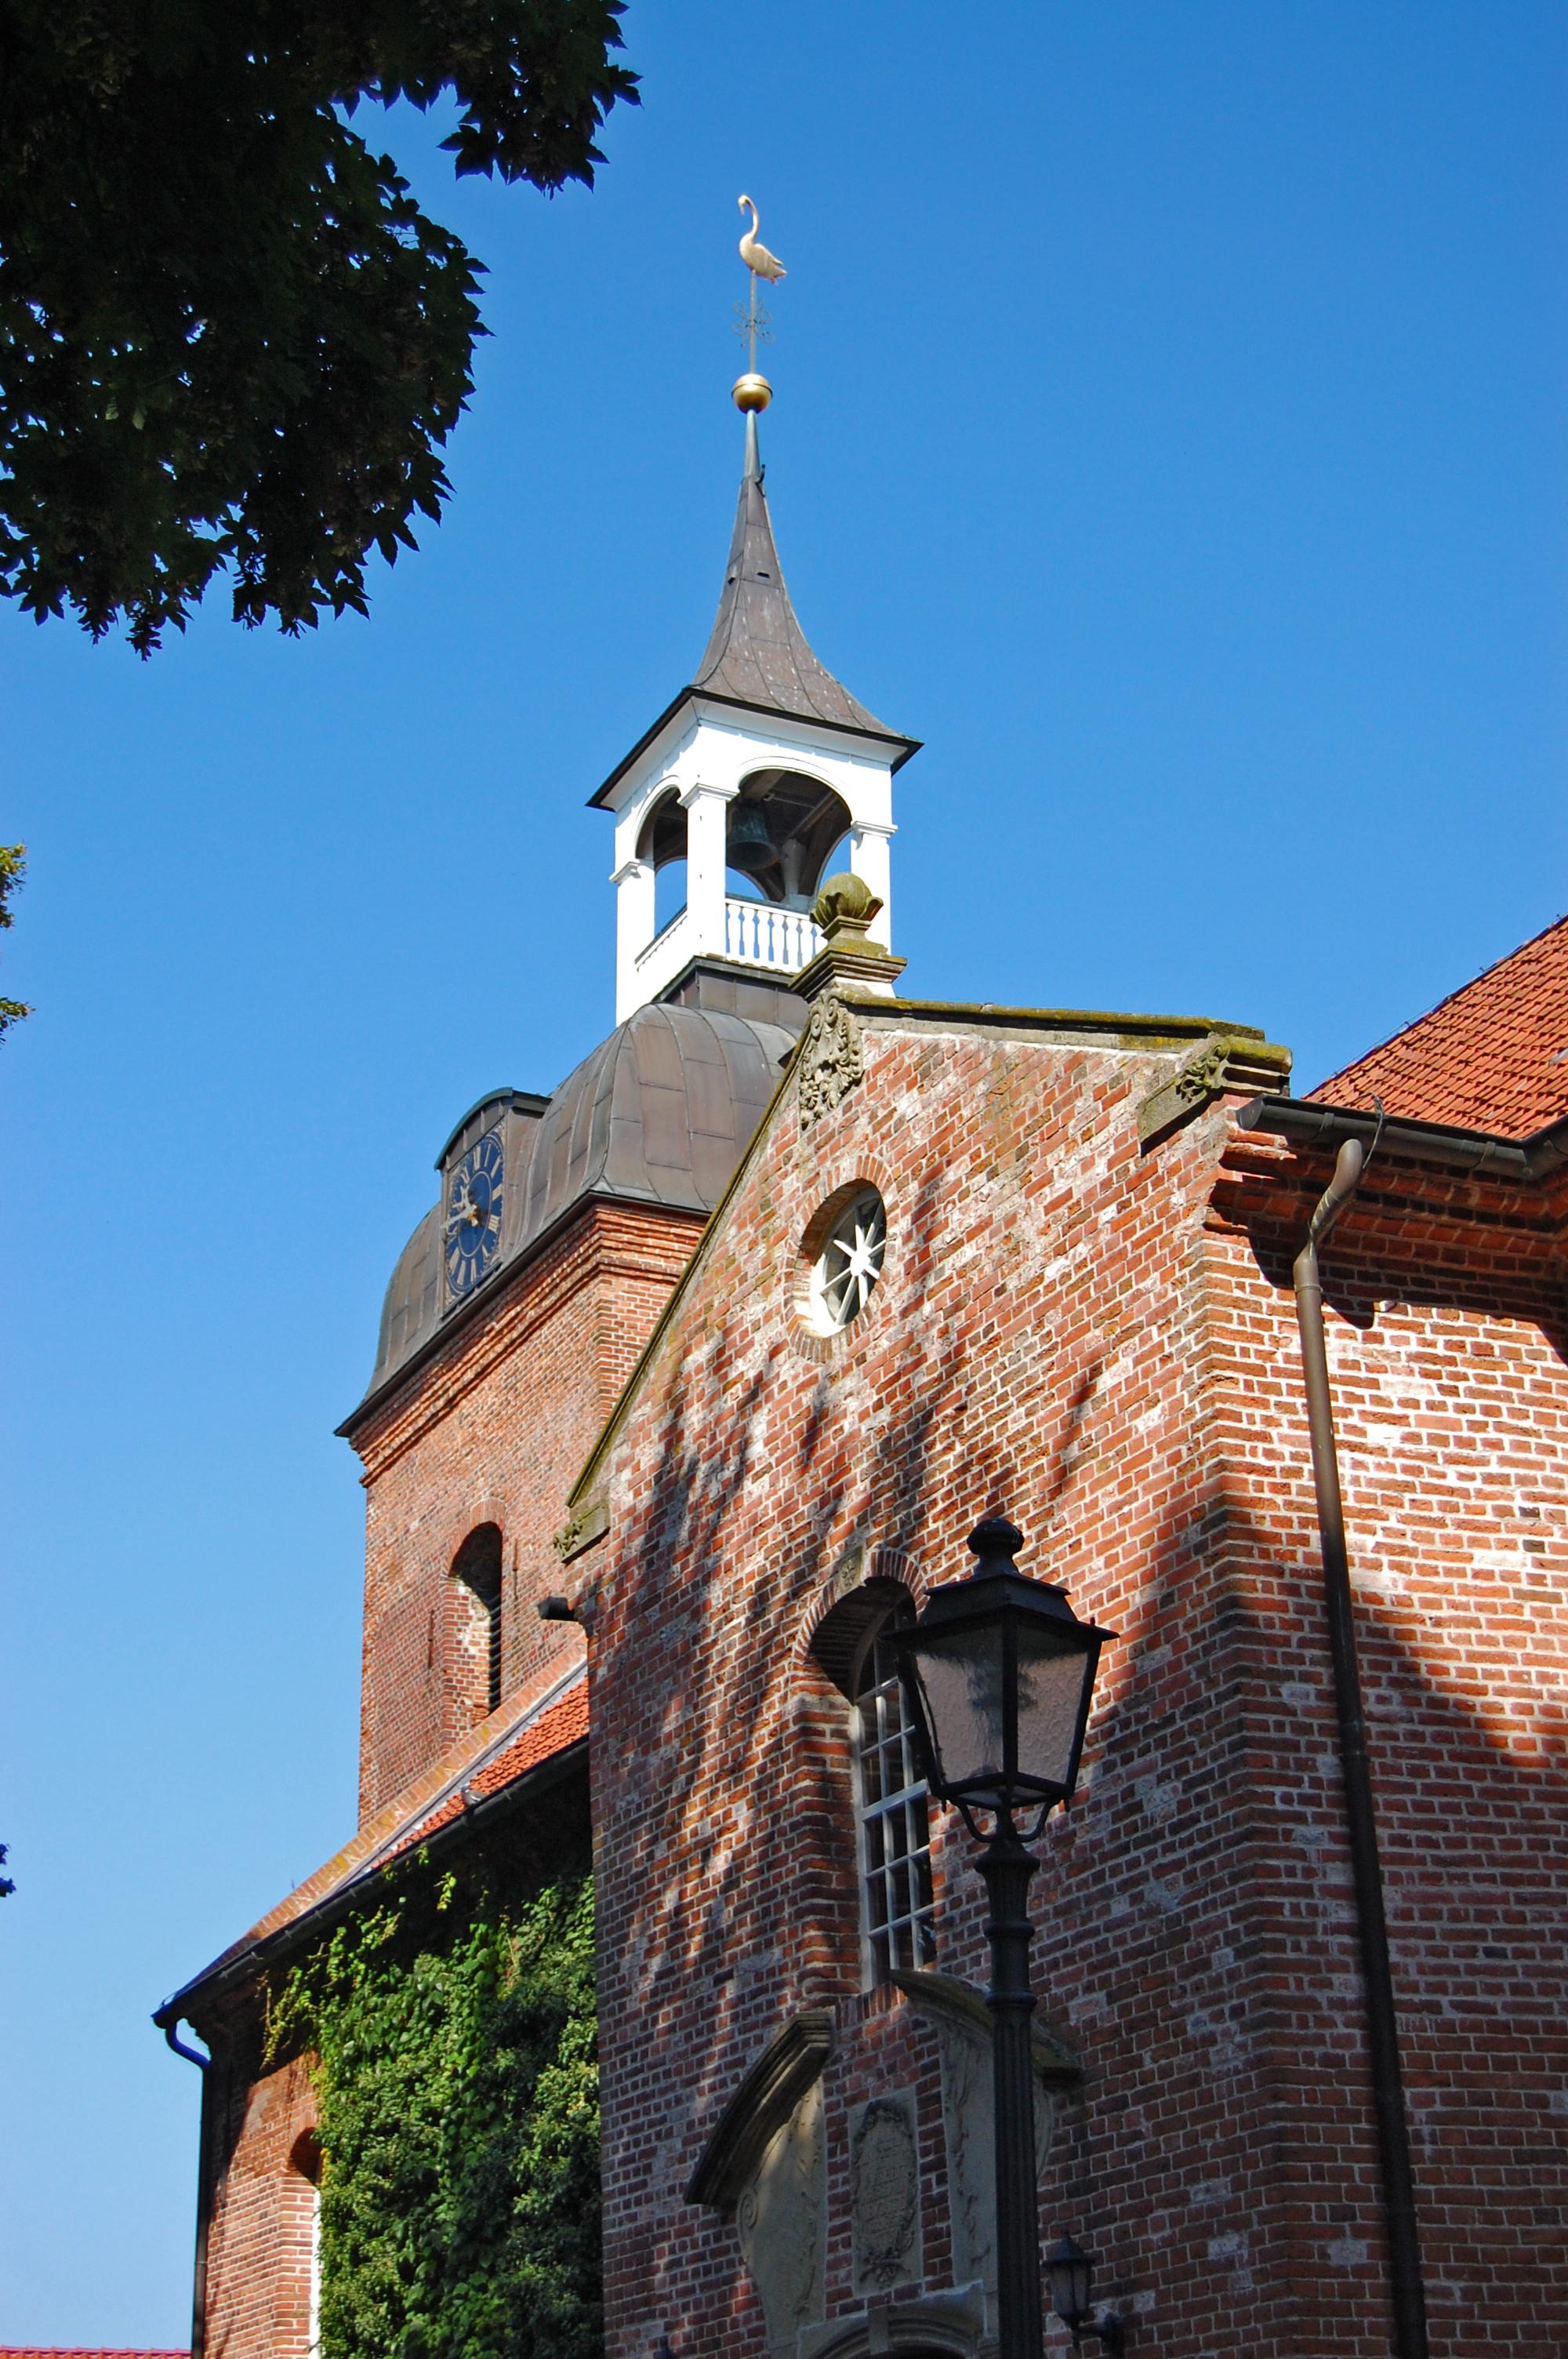 Historische St.-Nicolai Kirche in Wittmund